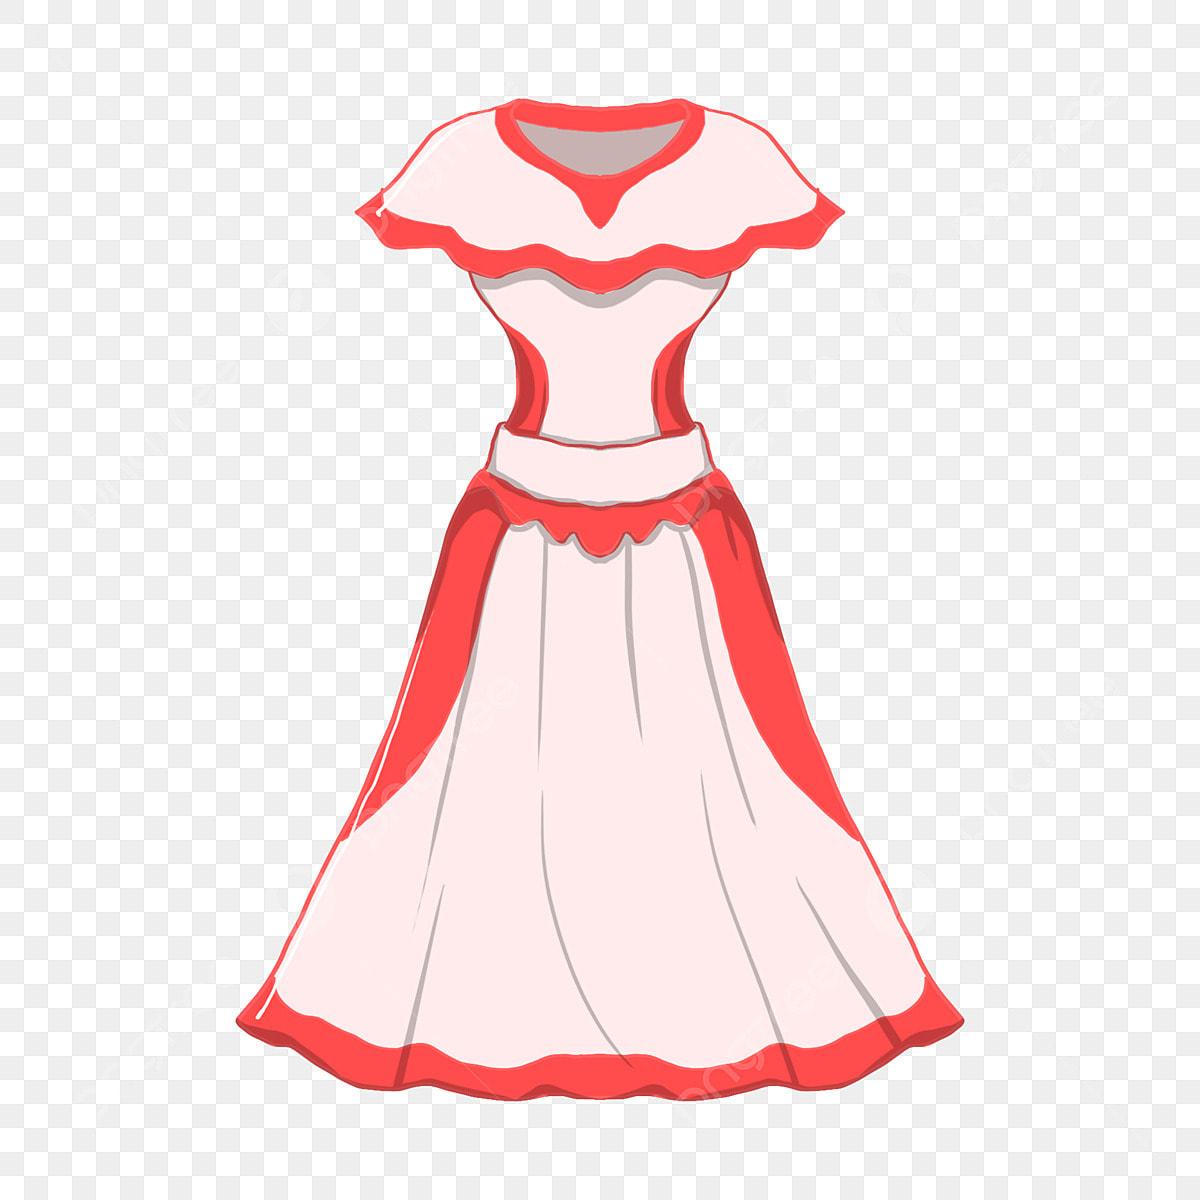 Evening Dress Clip Art - Royalty Free - GoGraph